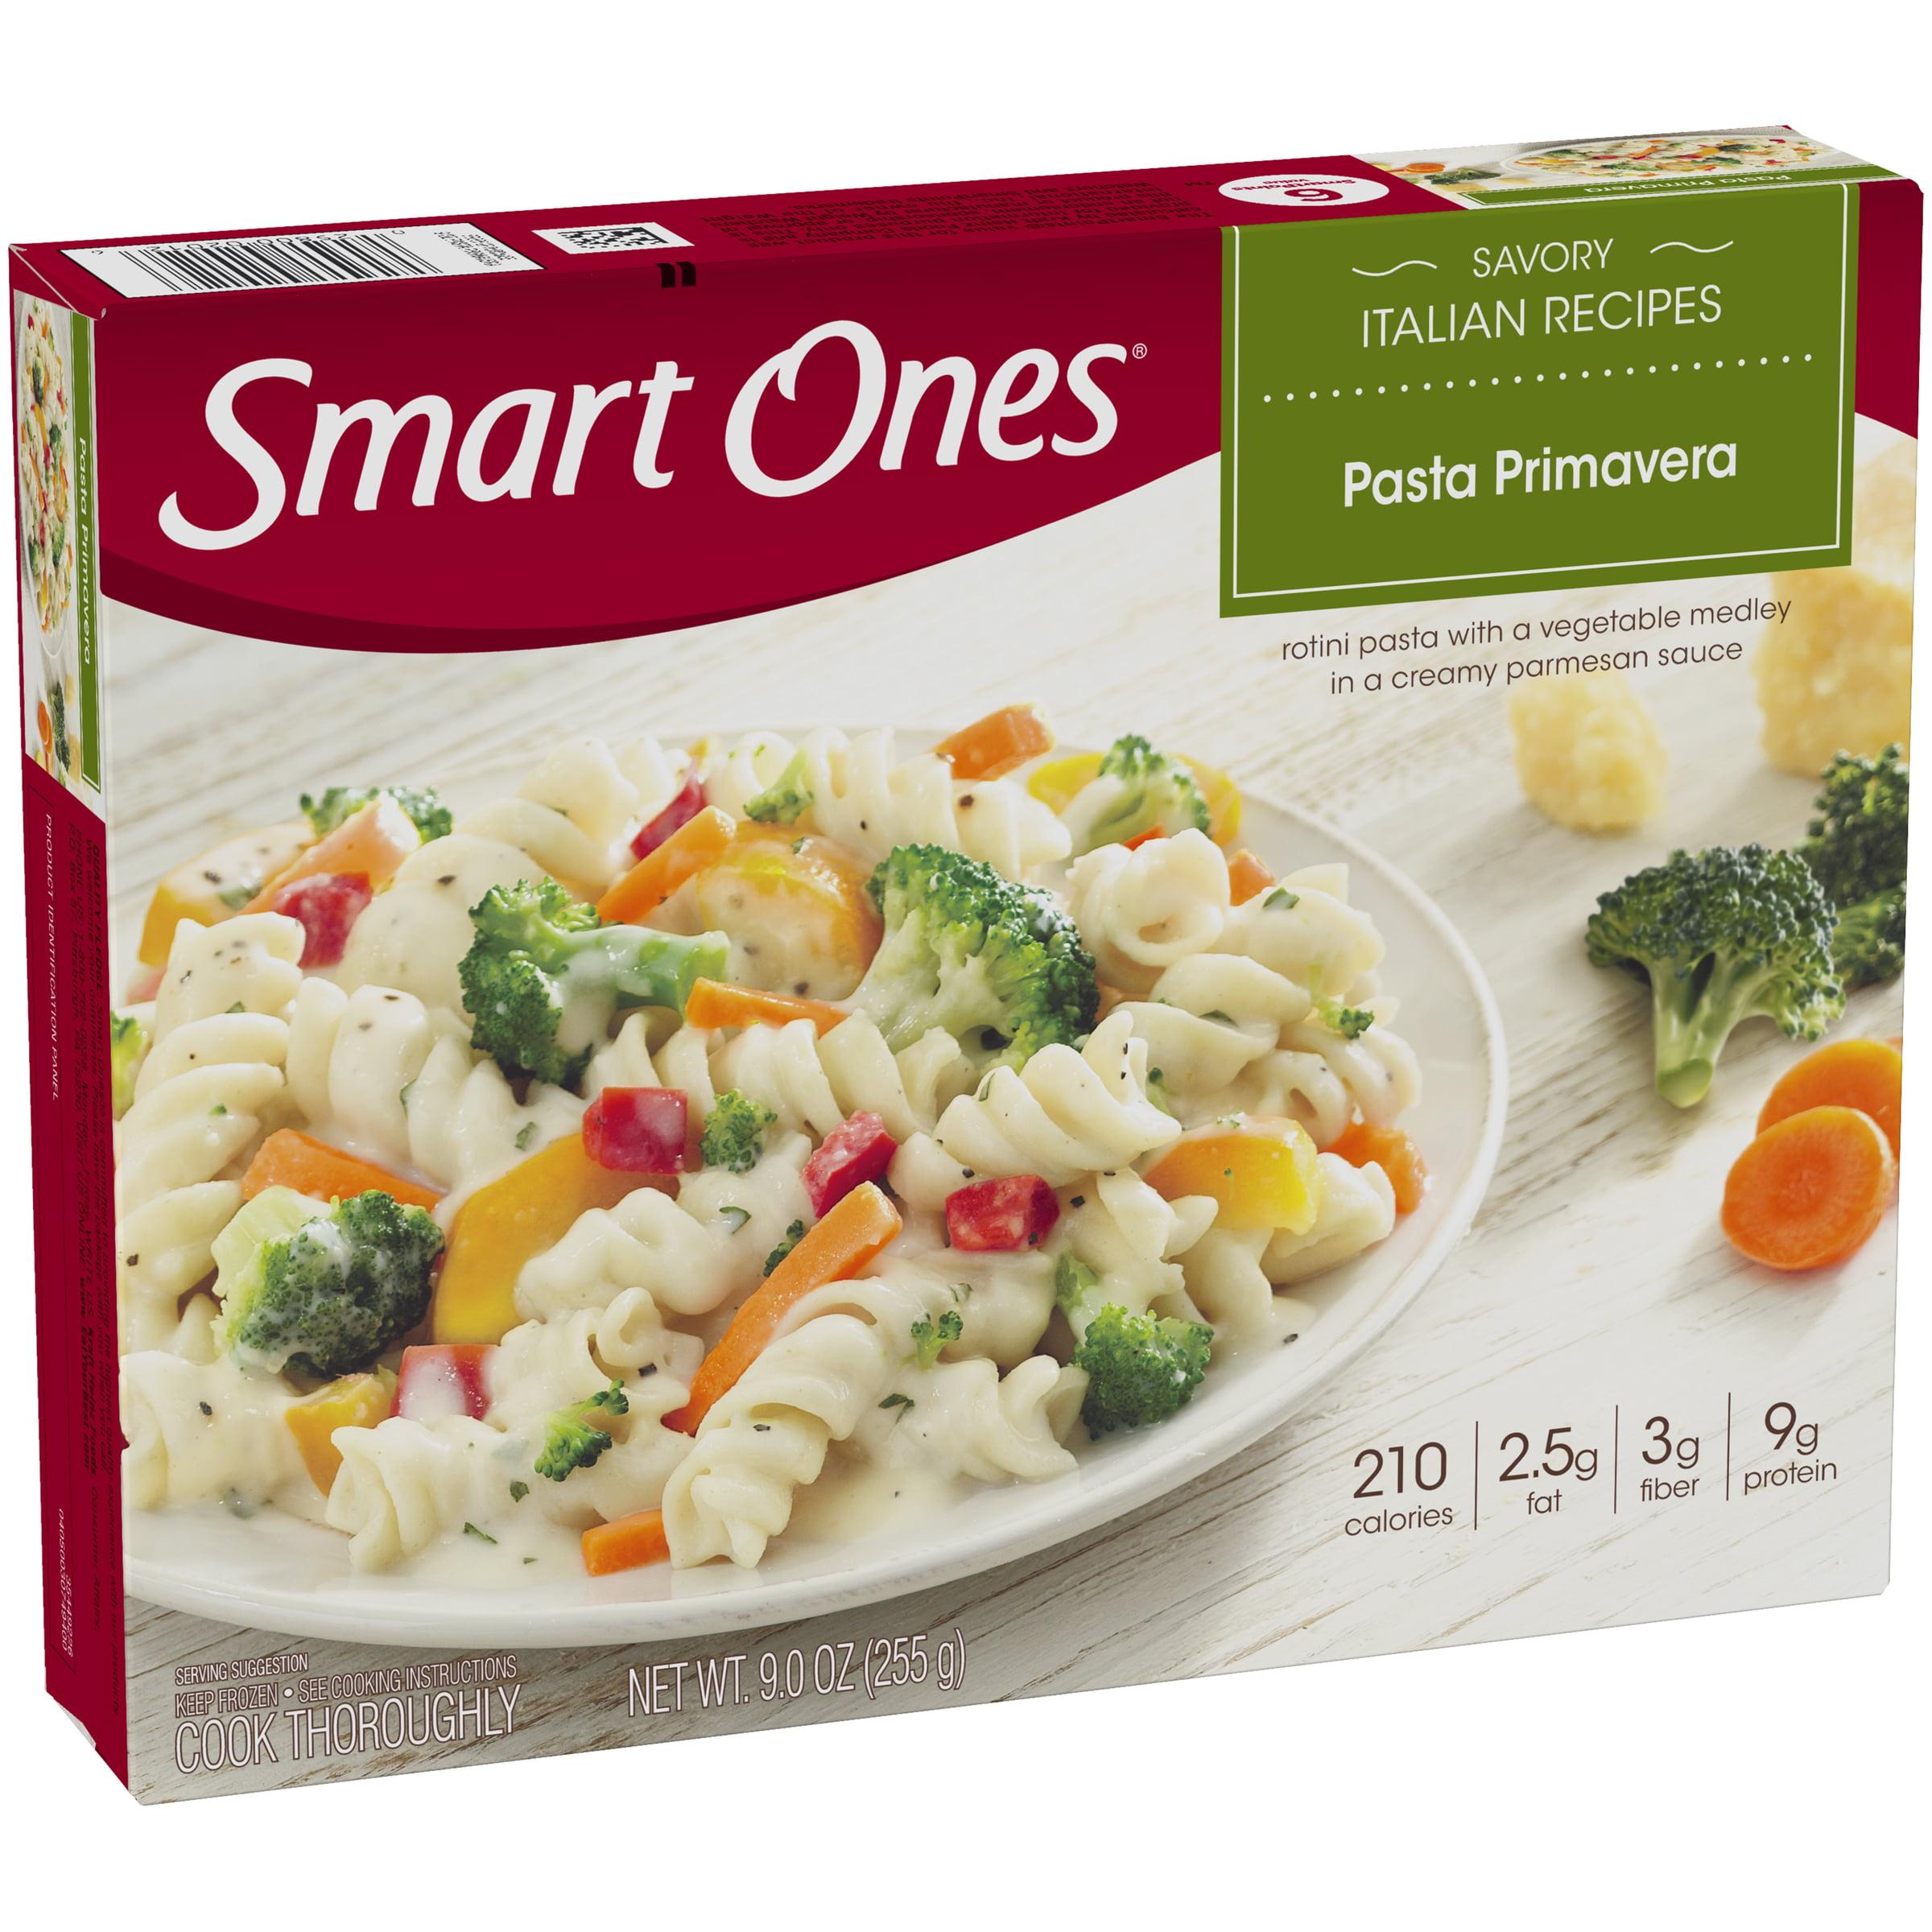 Weight Watchers Smart Ones Savory Italian Recipes Pasta Primavera 9 oz Box